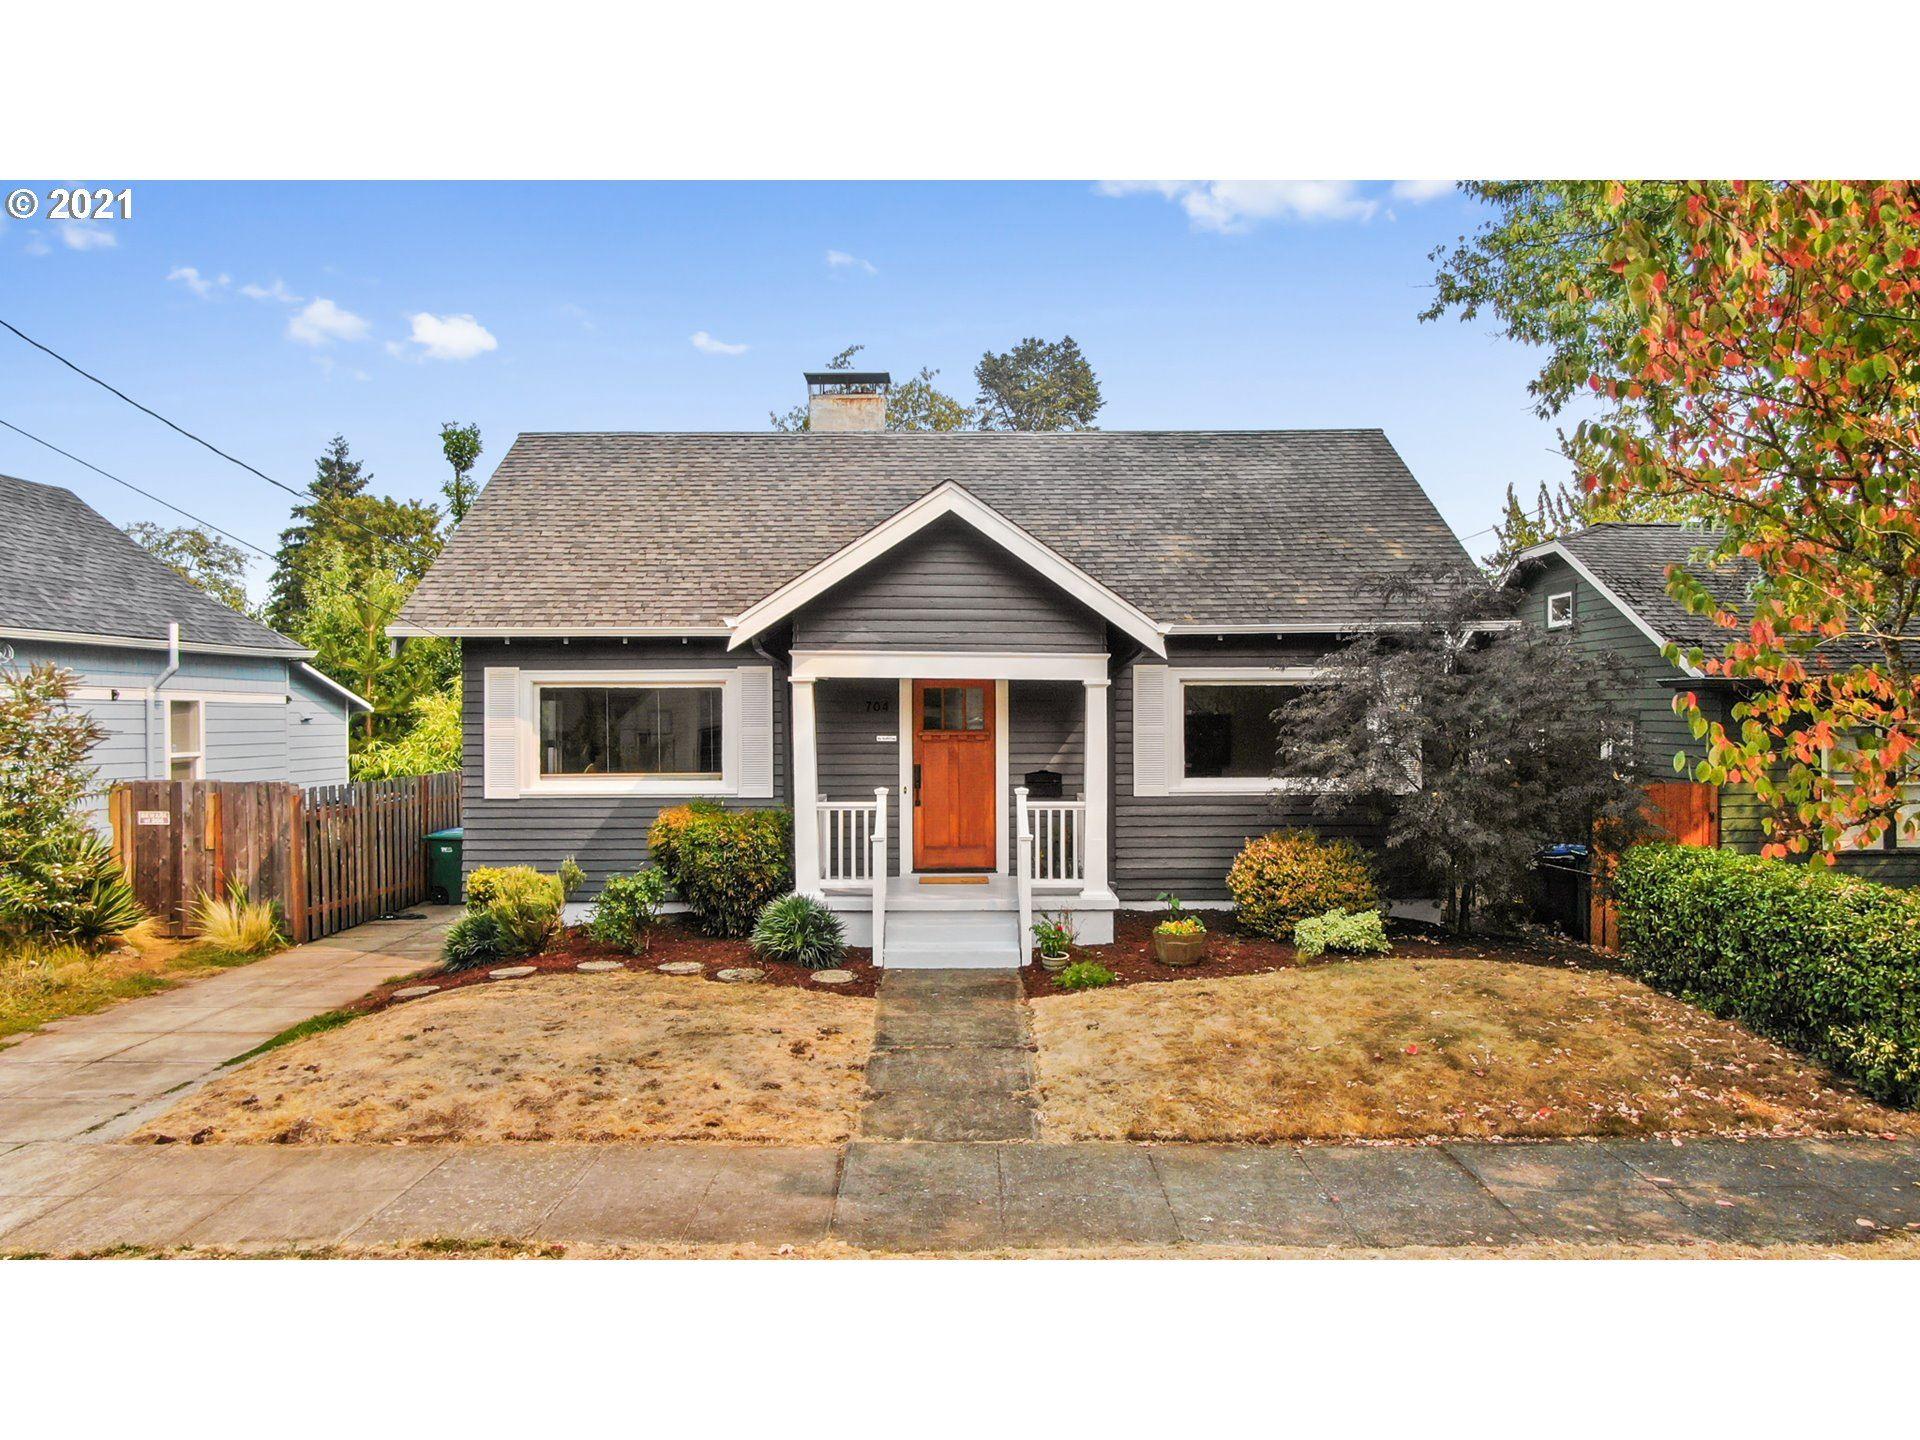 704 NE 74TH AVE, Portland, OR 97213 - MLS#: 21578551